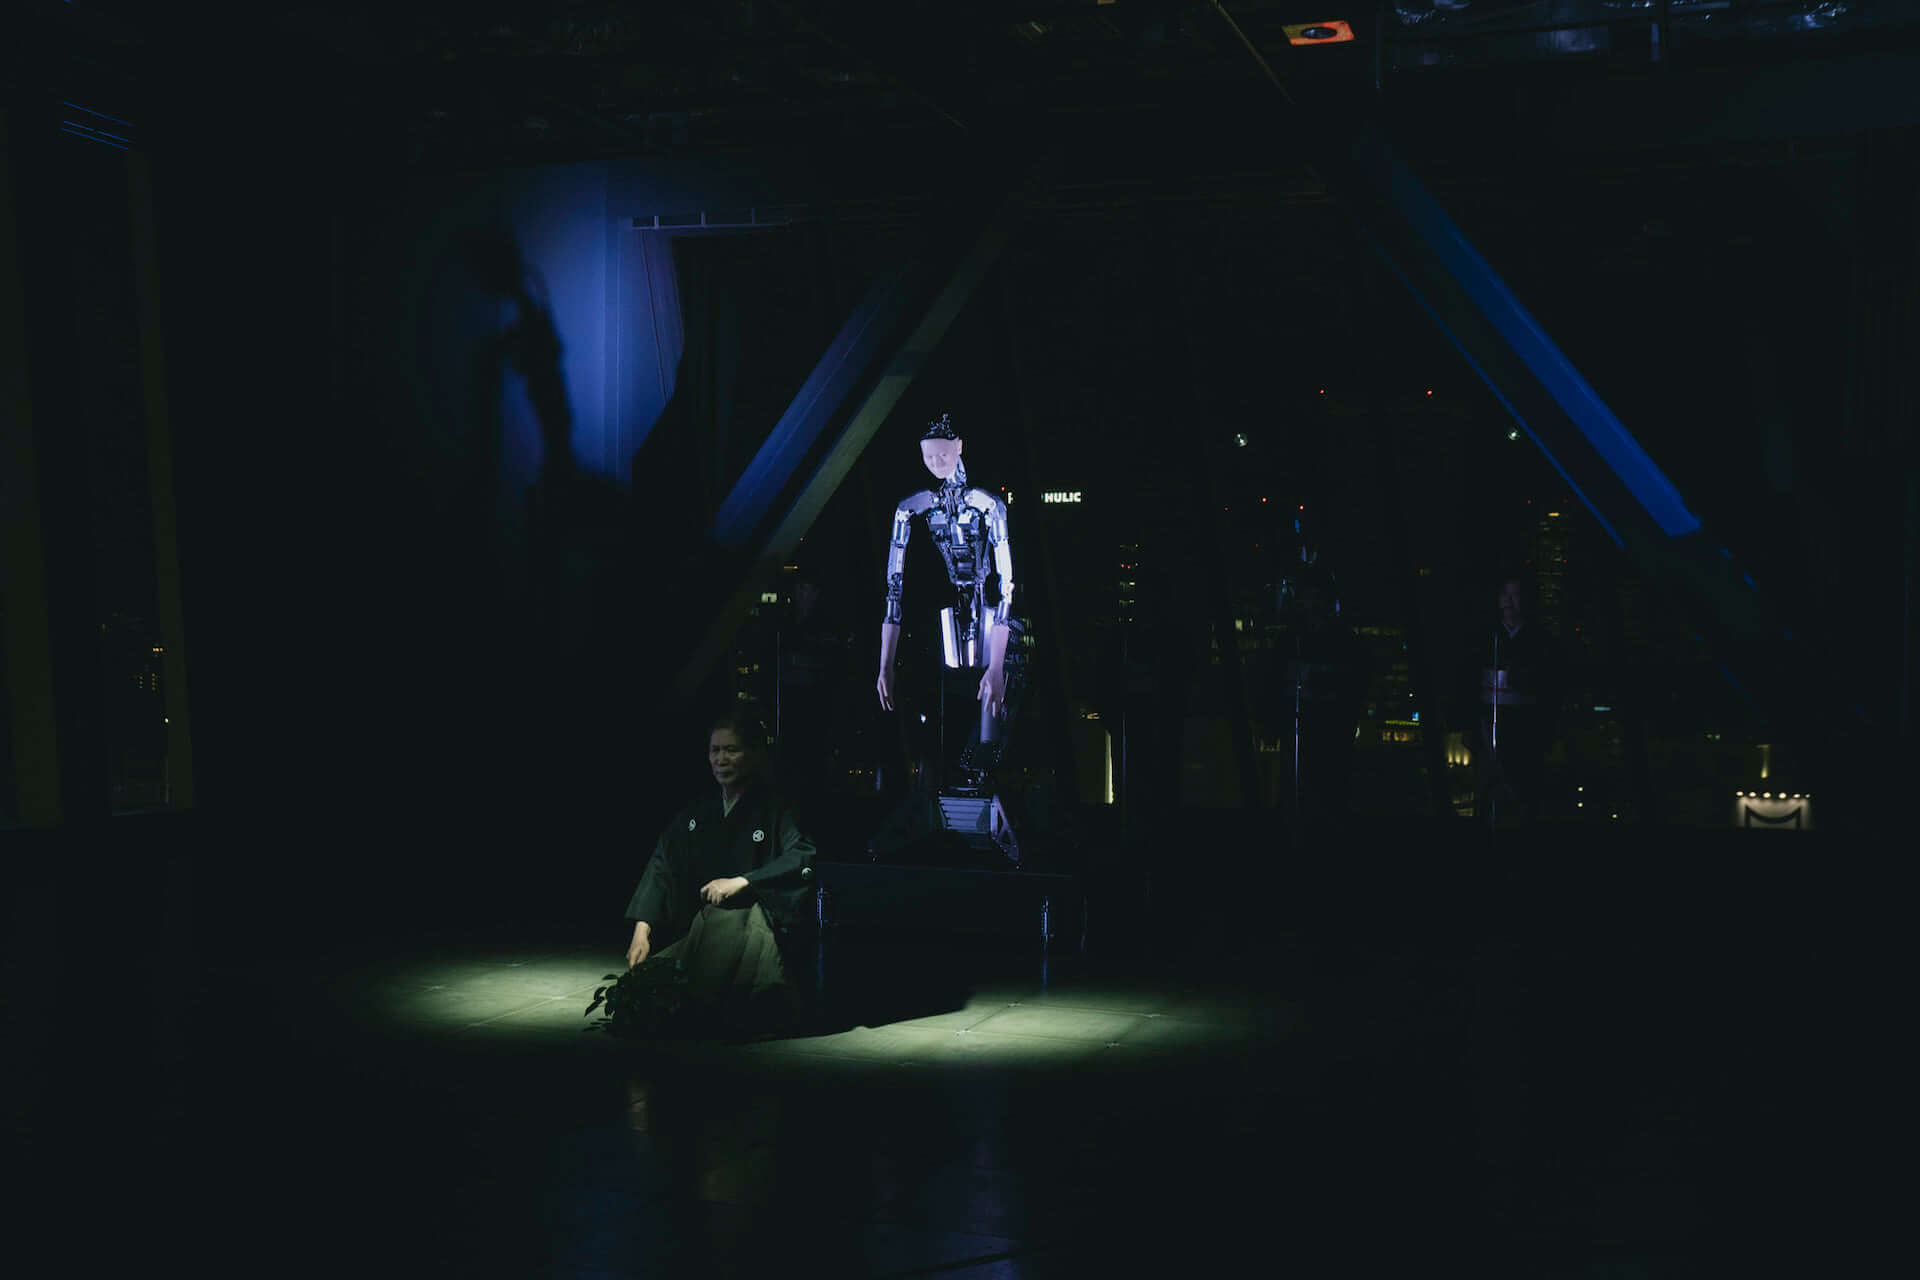 <MUTEK.JP 2020>がリアル&オンラインイベントとして開催決定!真鍋大度、中山晃子、Kyoka、Shohei Fujimoto、Neutralらが出演 art201111_mutek_22-1920x1280